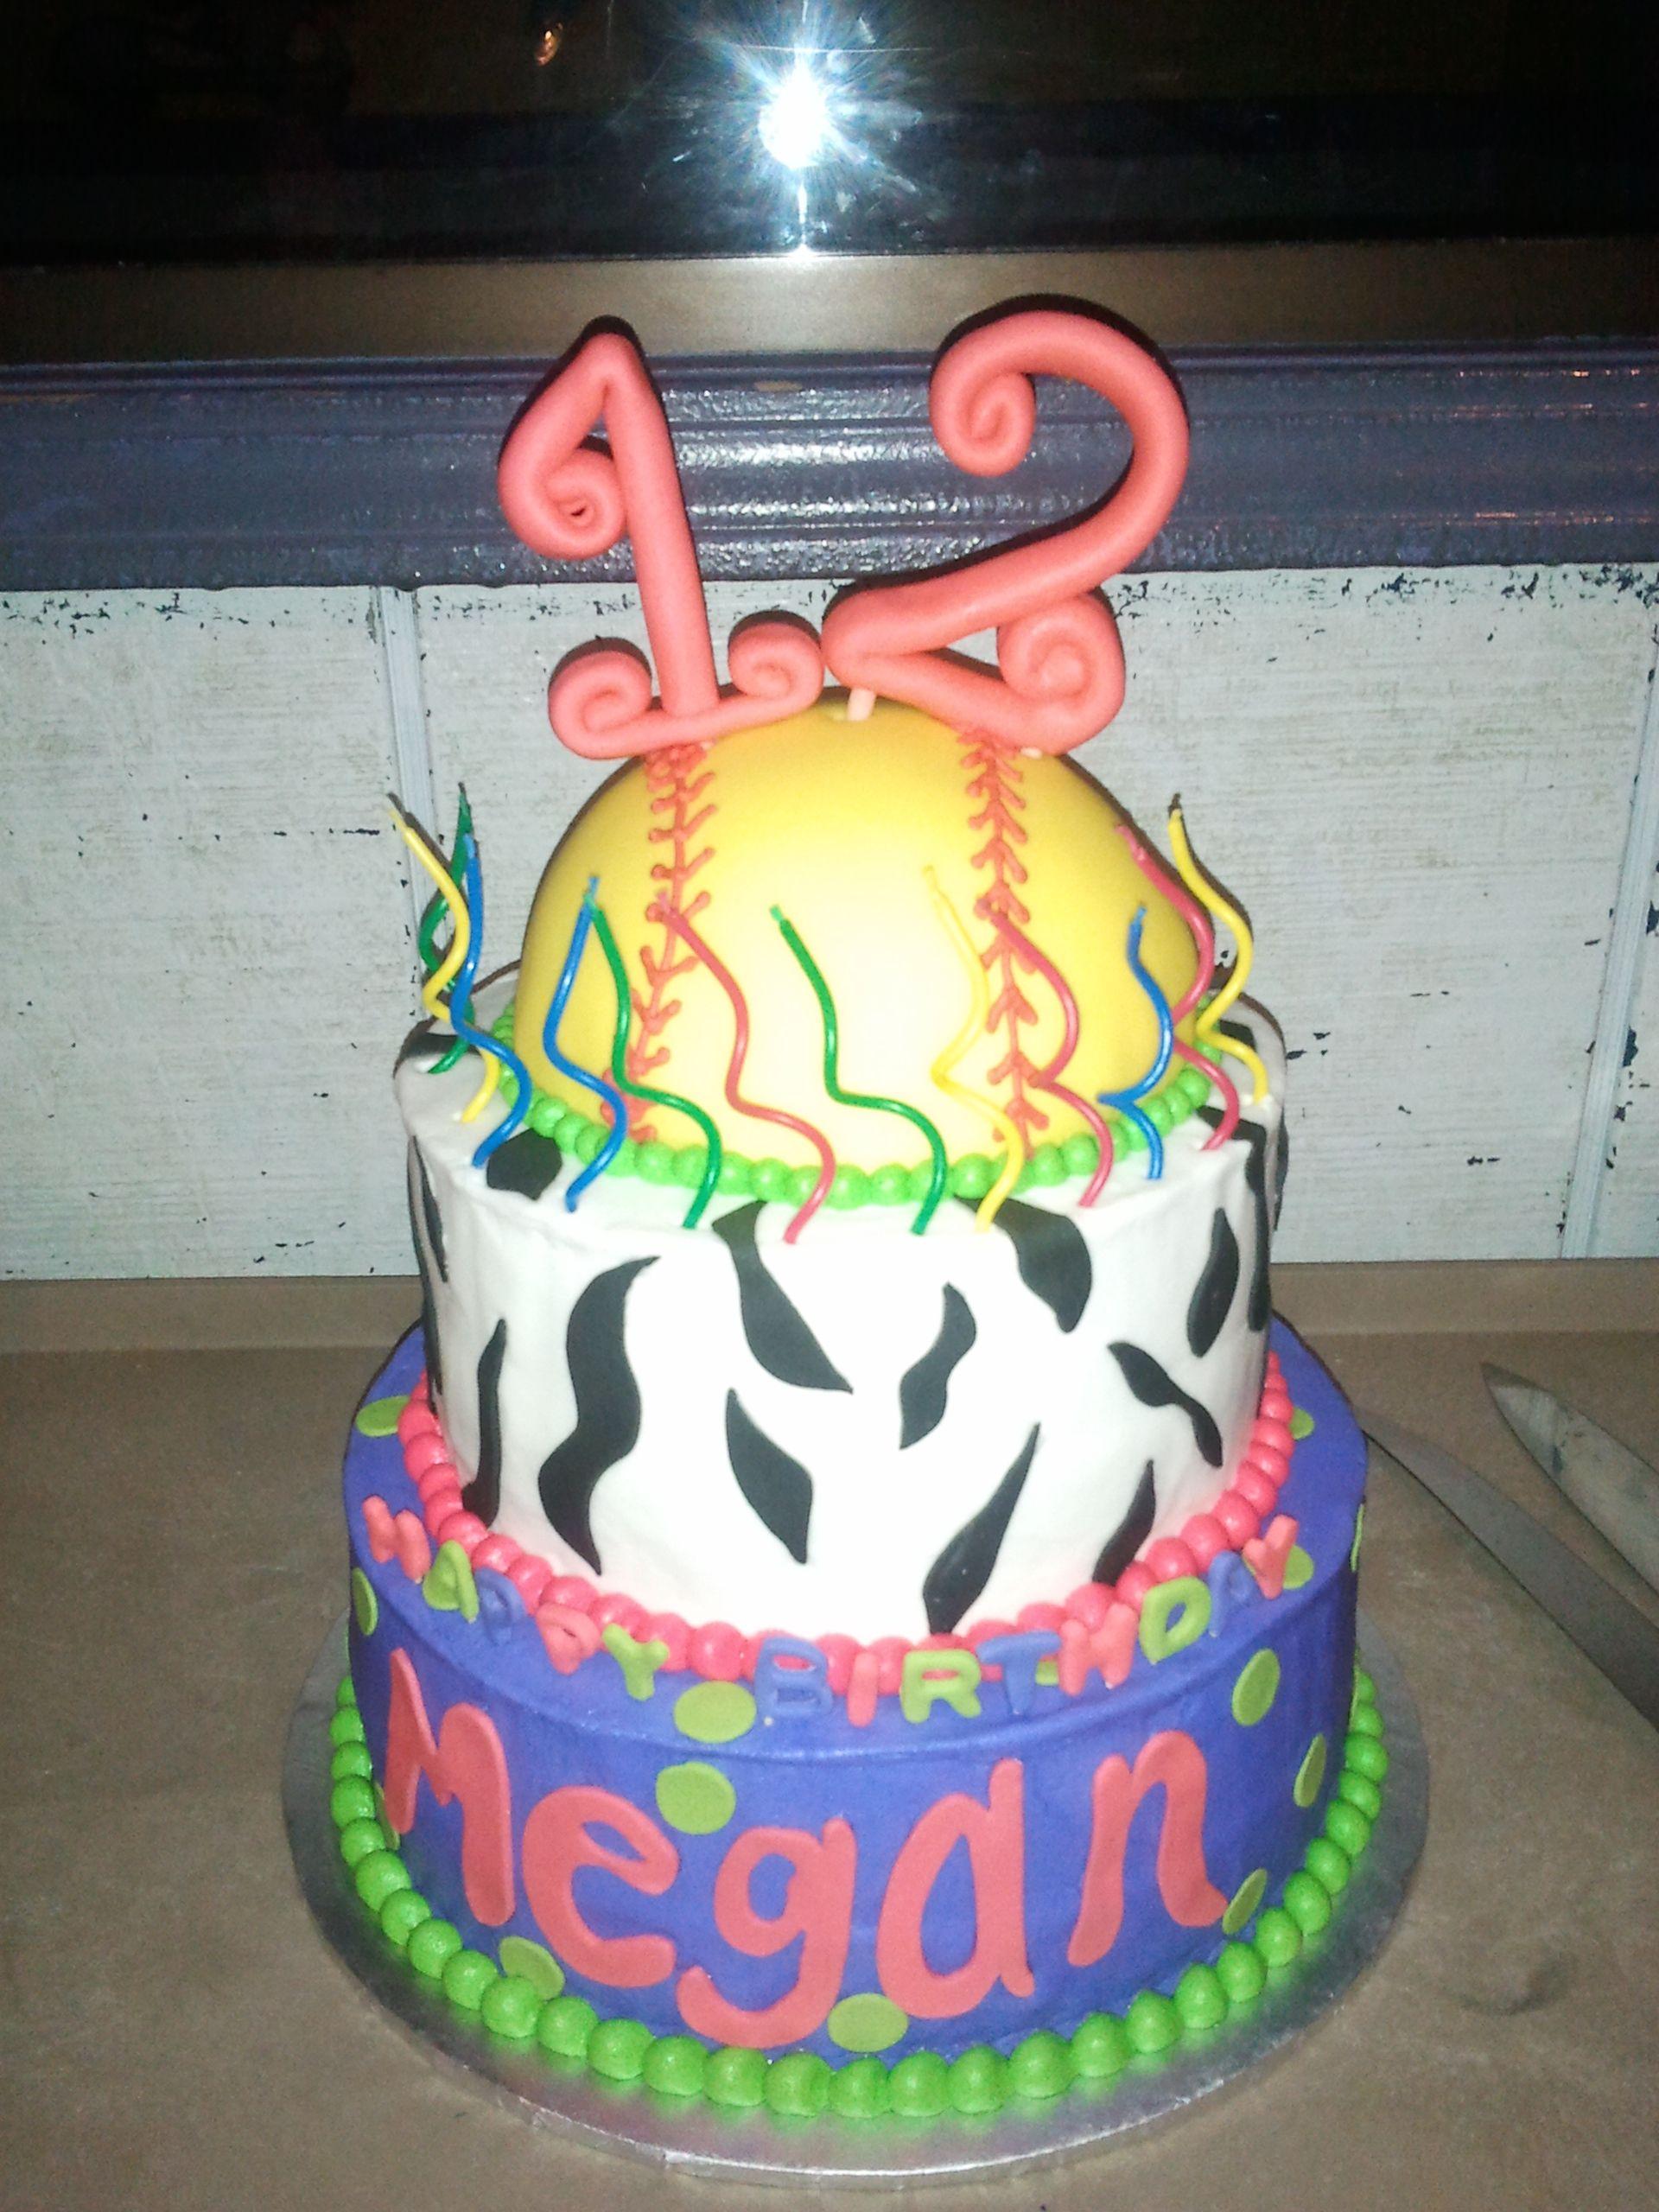 My Sister Megans Neon Softball Birthday Cake Megan James Yum